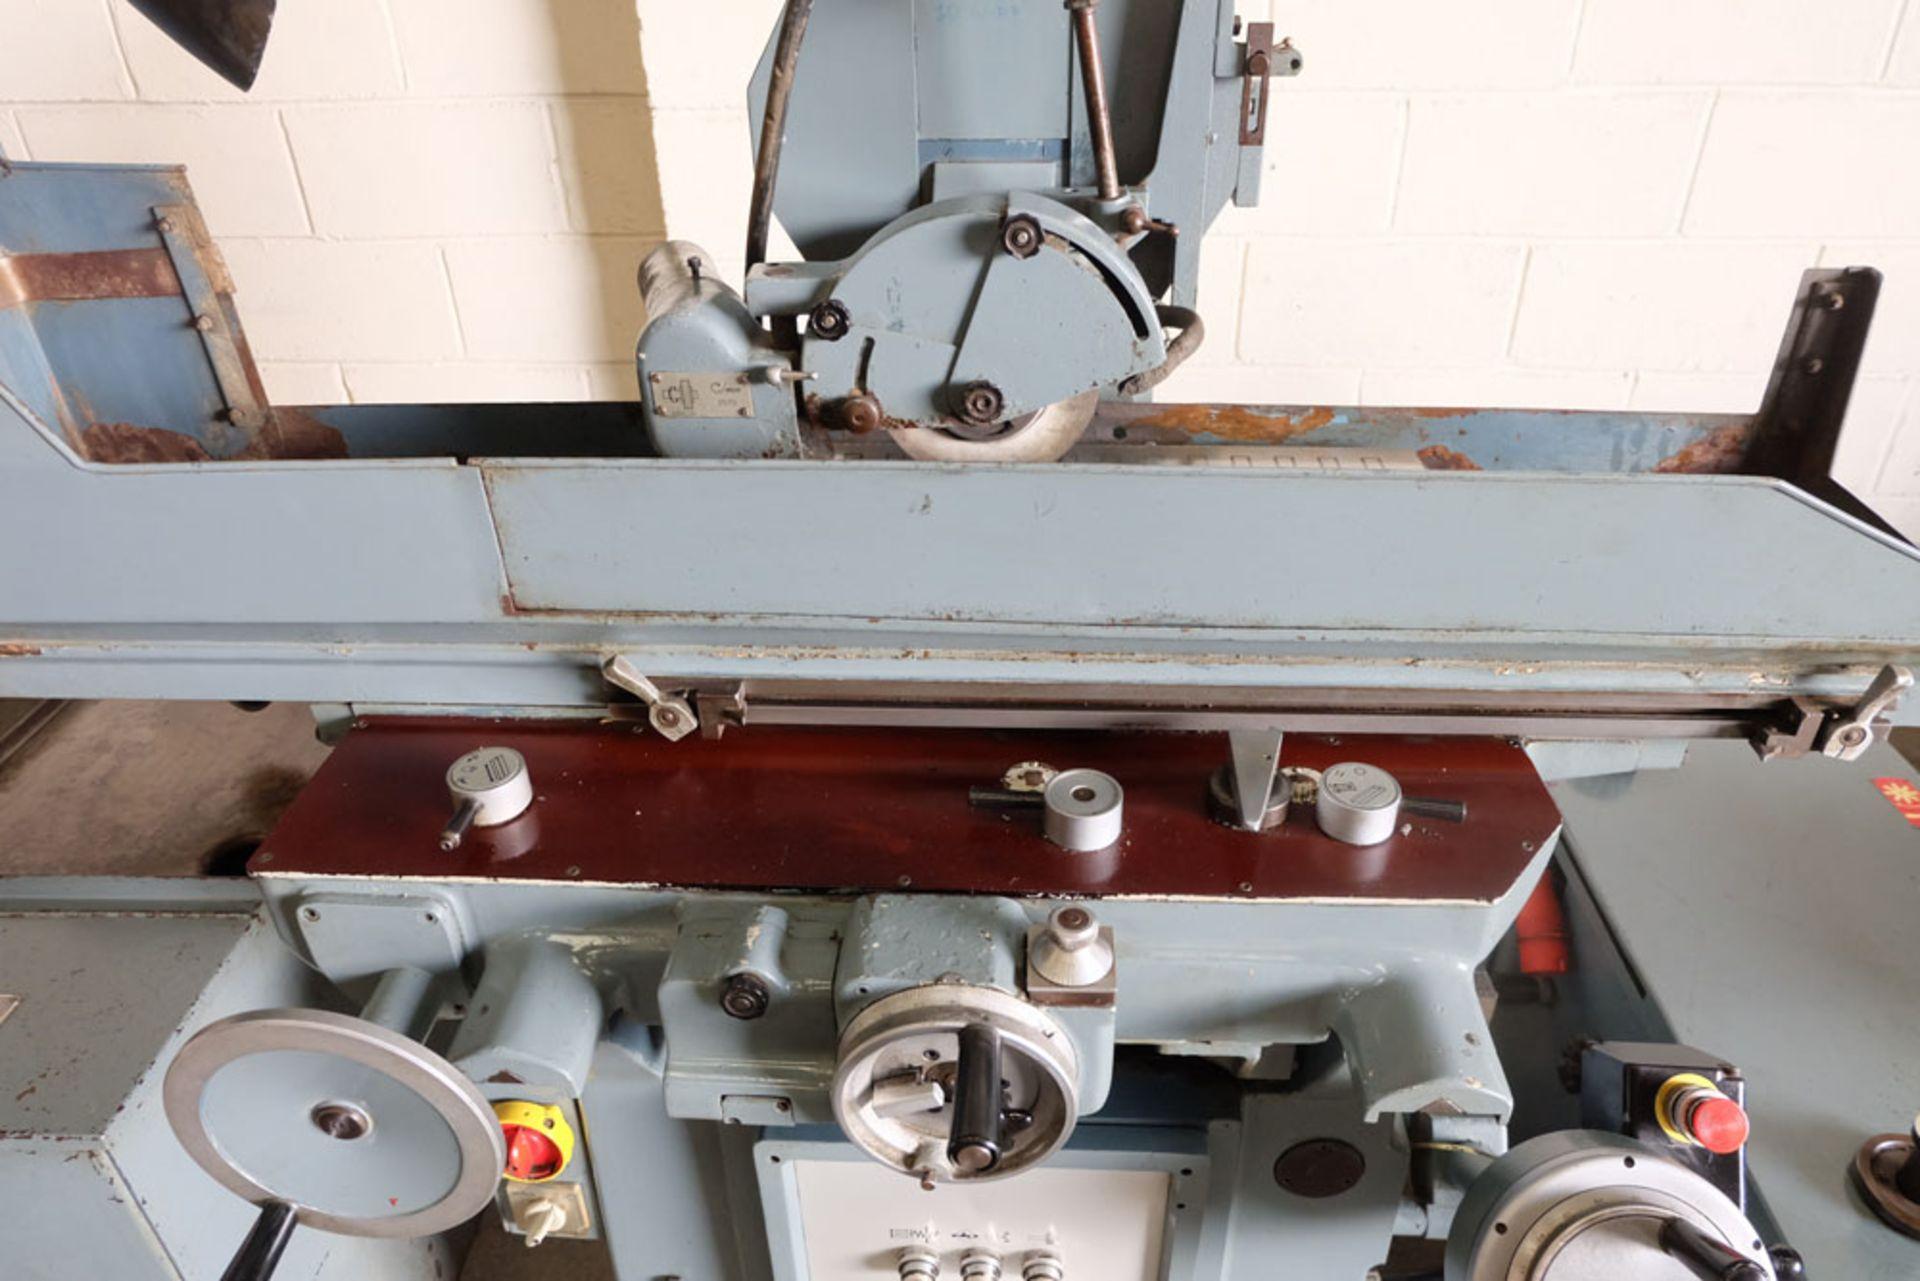 Jones & Shipman 1400P Toolroom Surface Grinder. - Image 9 of 13